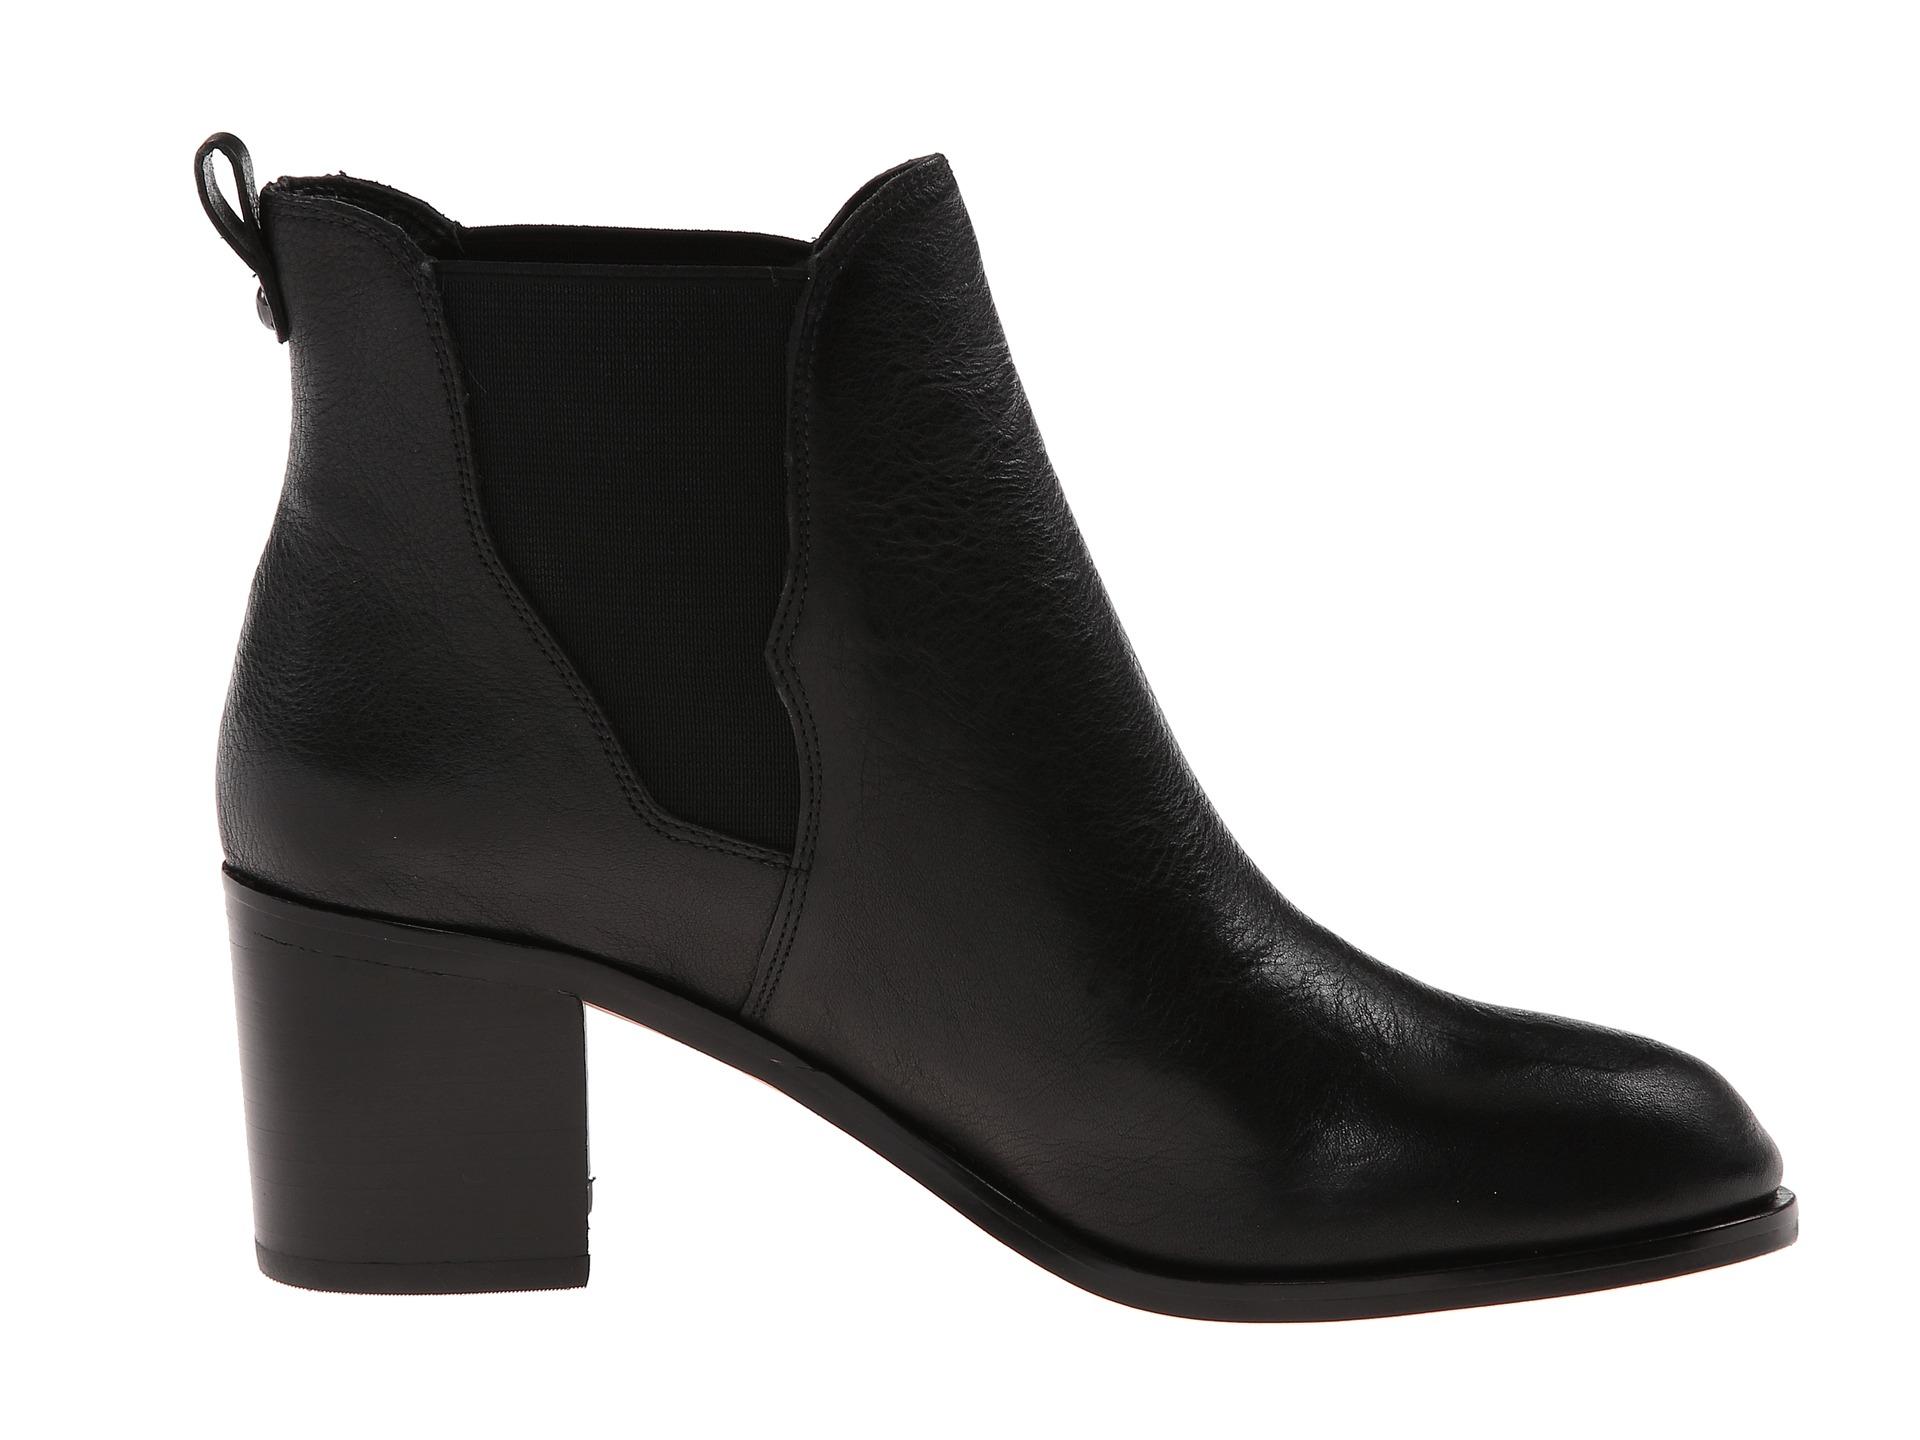 868ca44fb874 Lyst - Sam Edelman Justin Ankle Boot Black Leather in Black